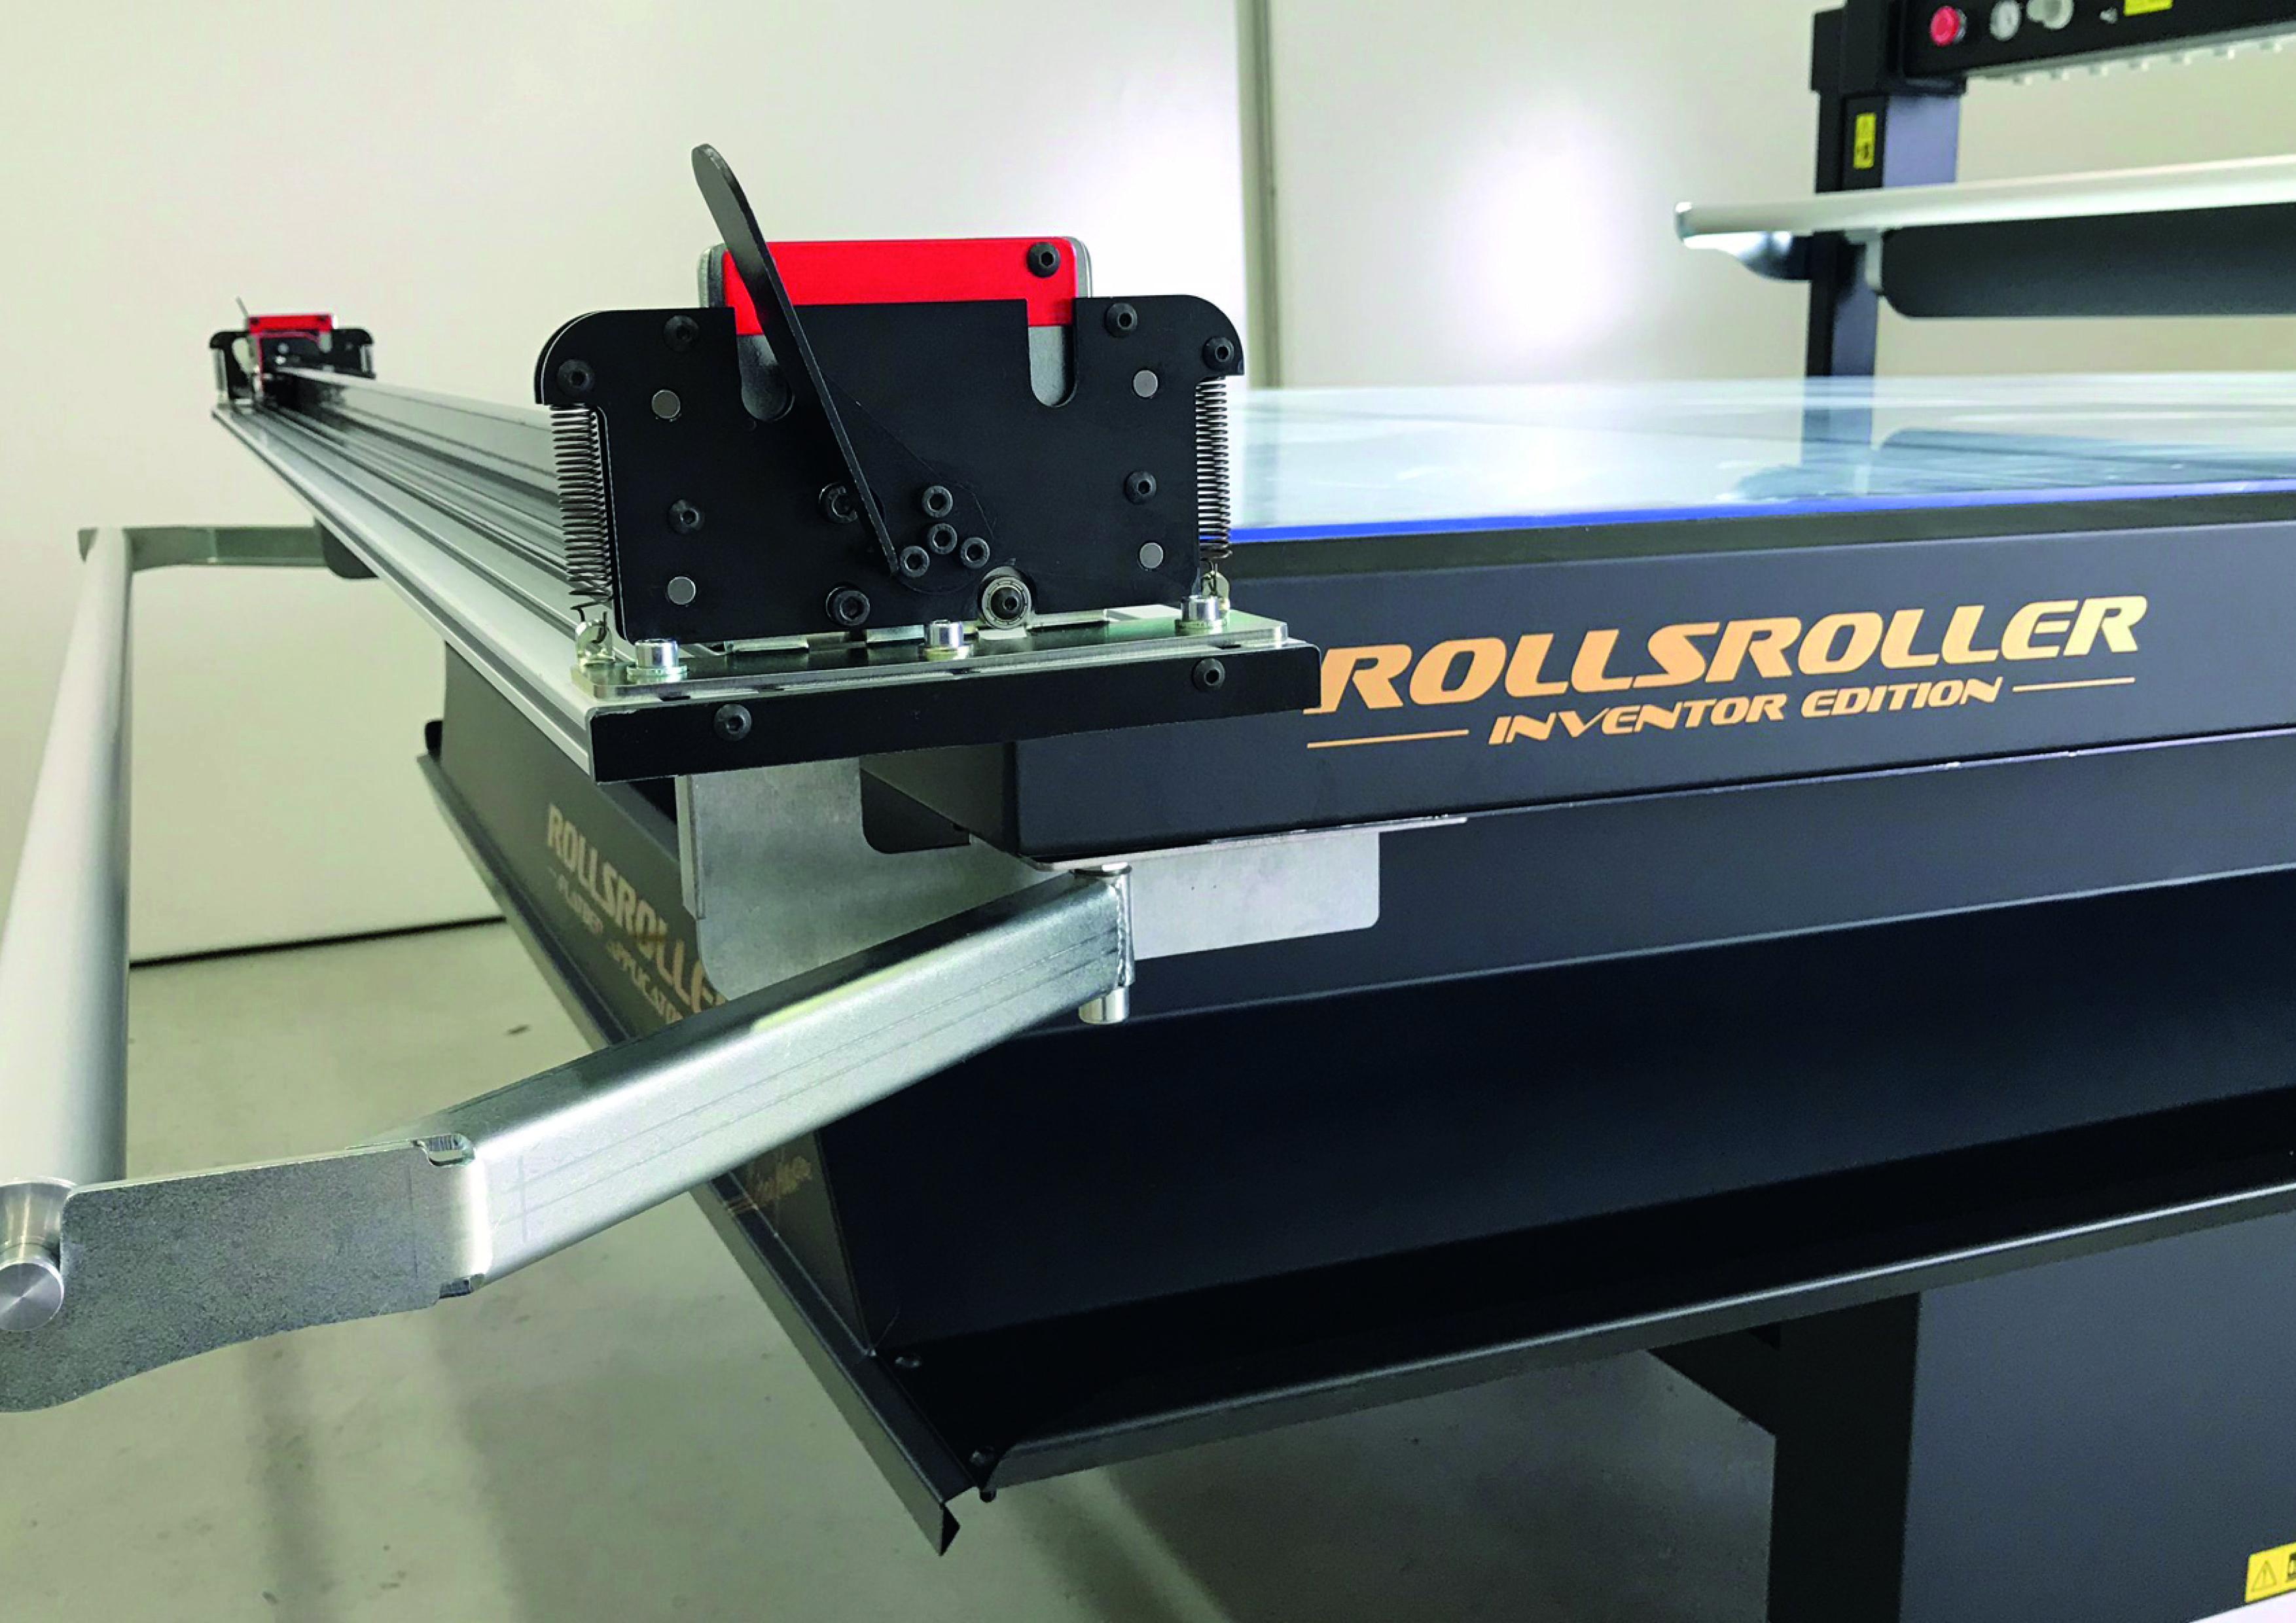 Pin Pa Rollsroller Flatbed Applicator